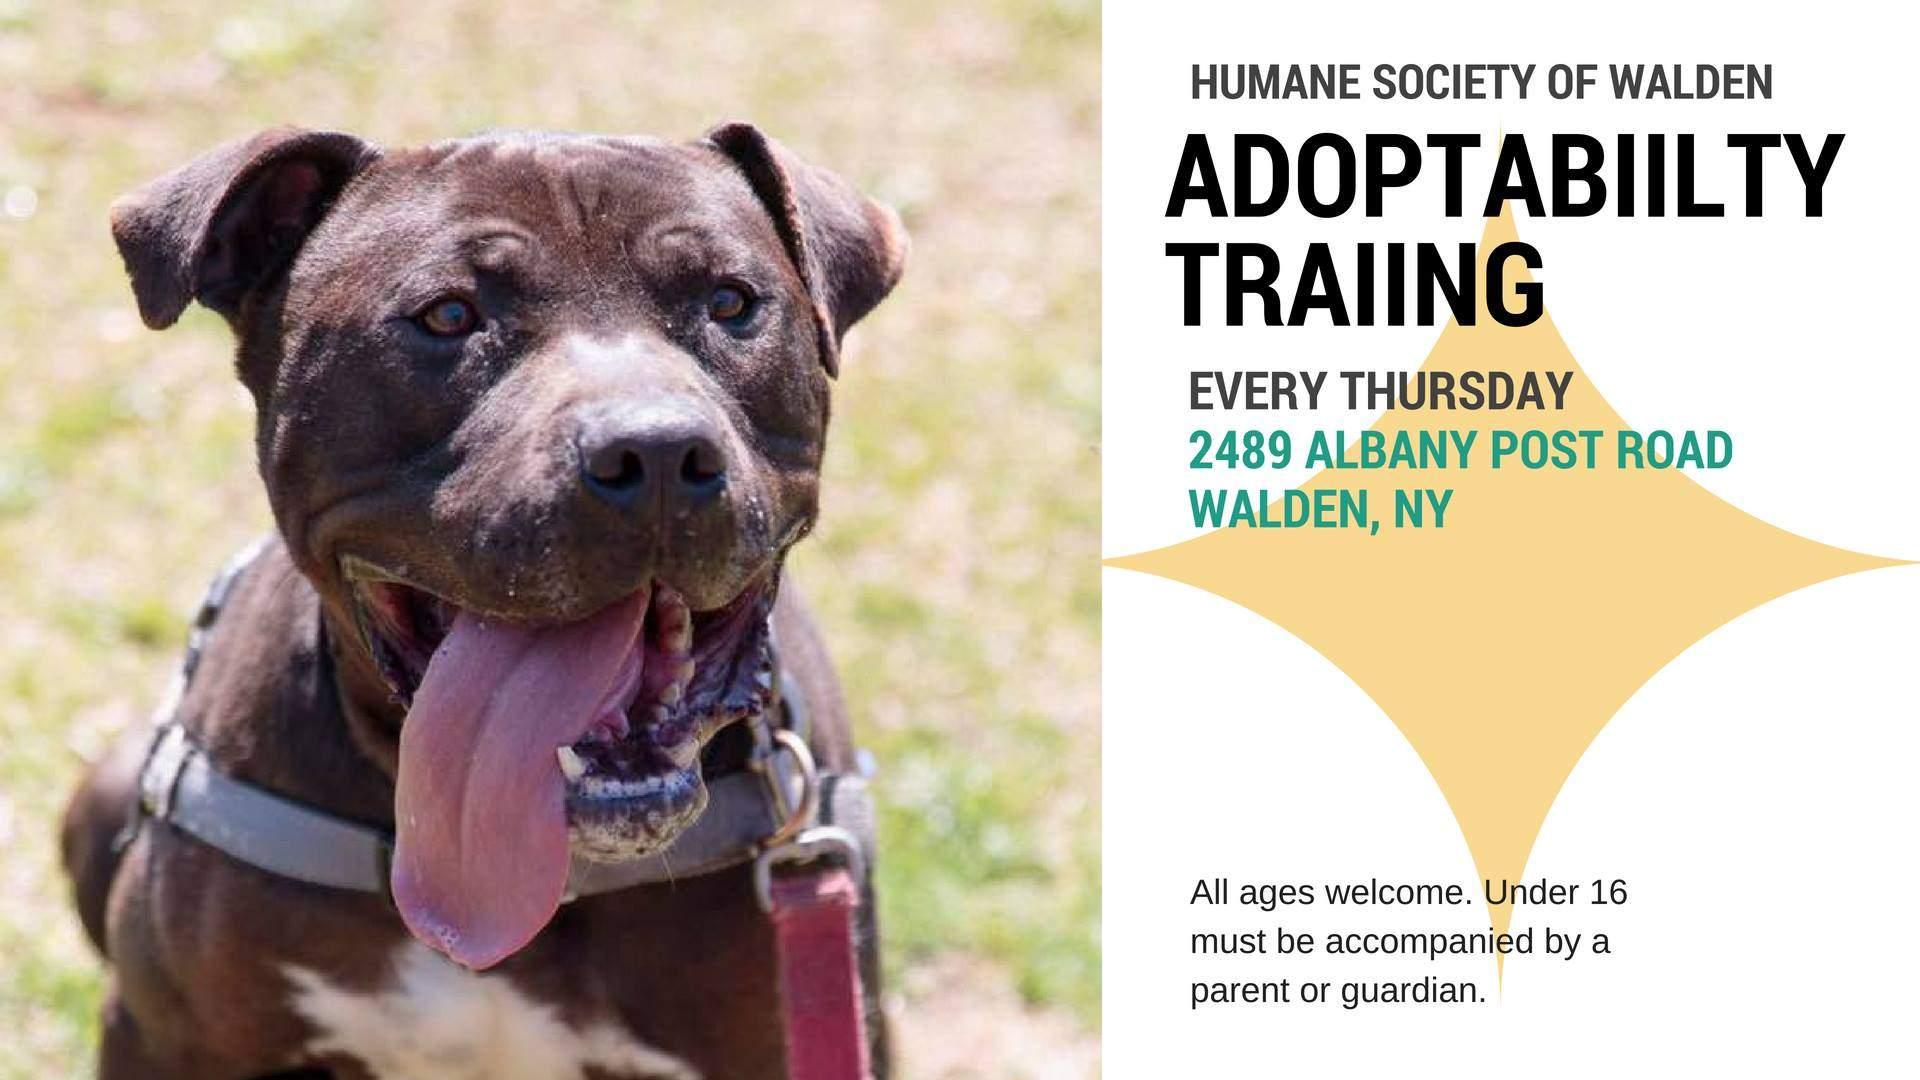 Adoptability Training